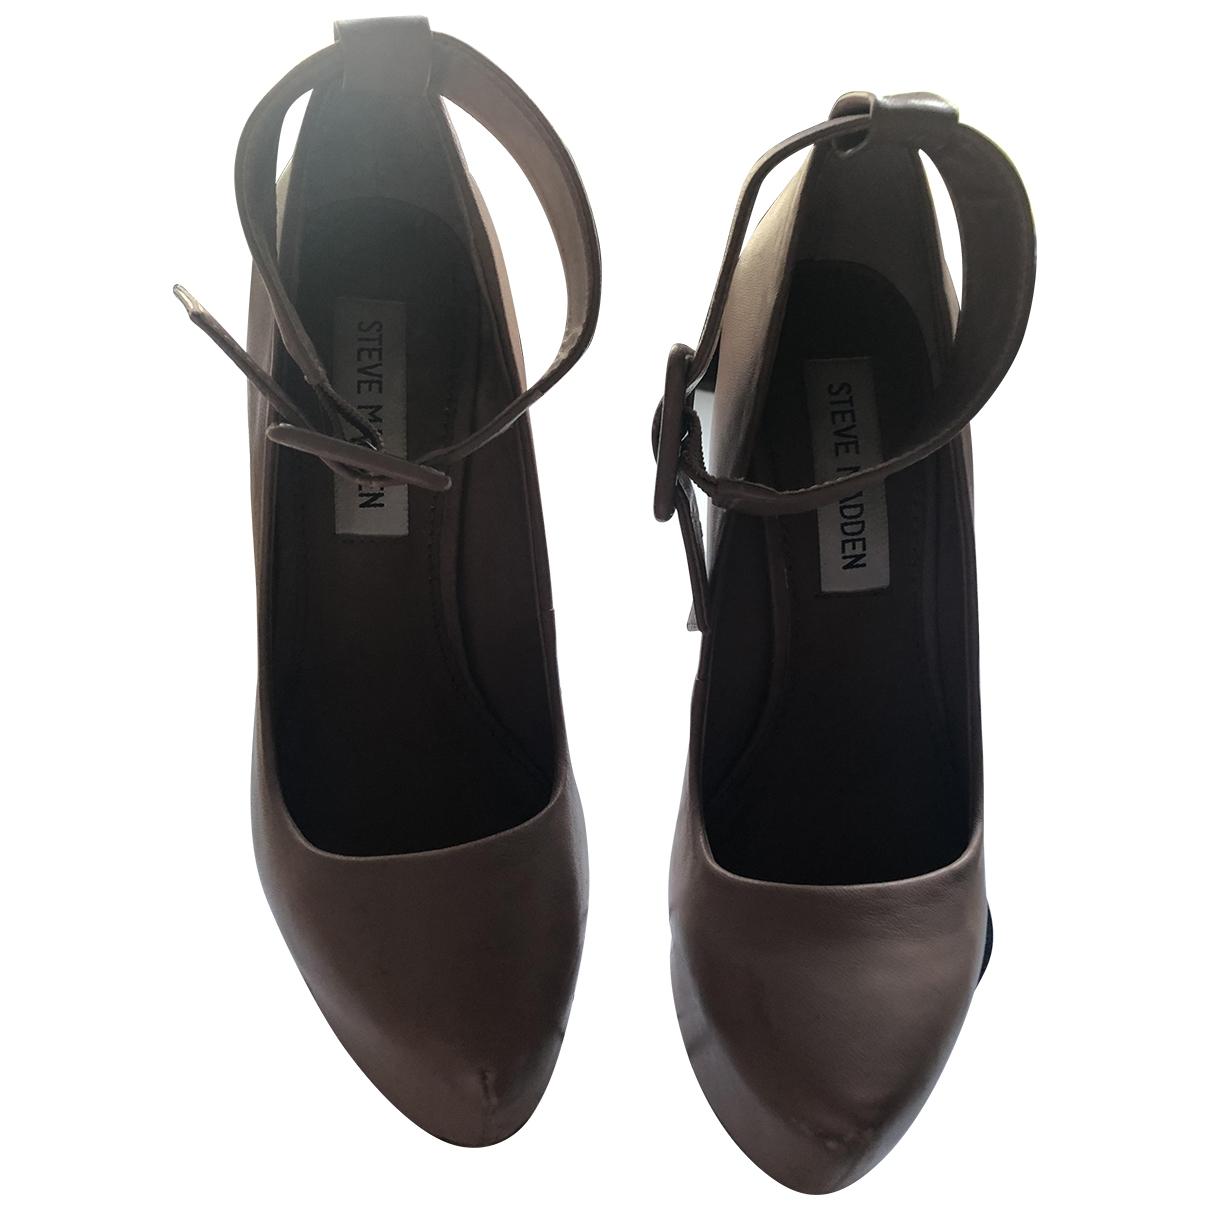 Steve Madden \N Brown Leather Heels for Women 35 EU